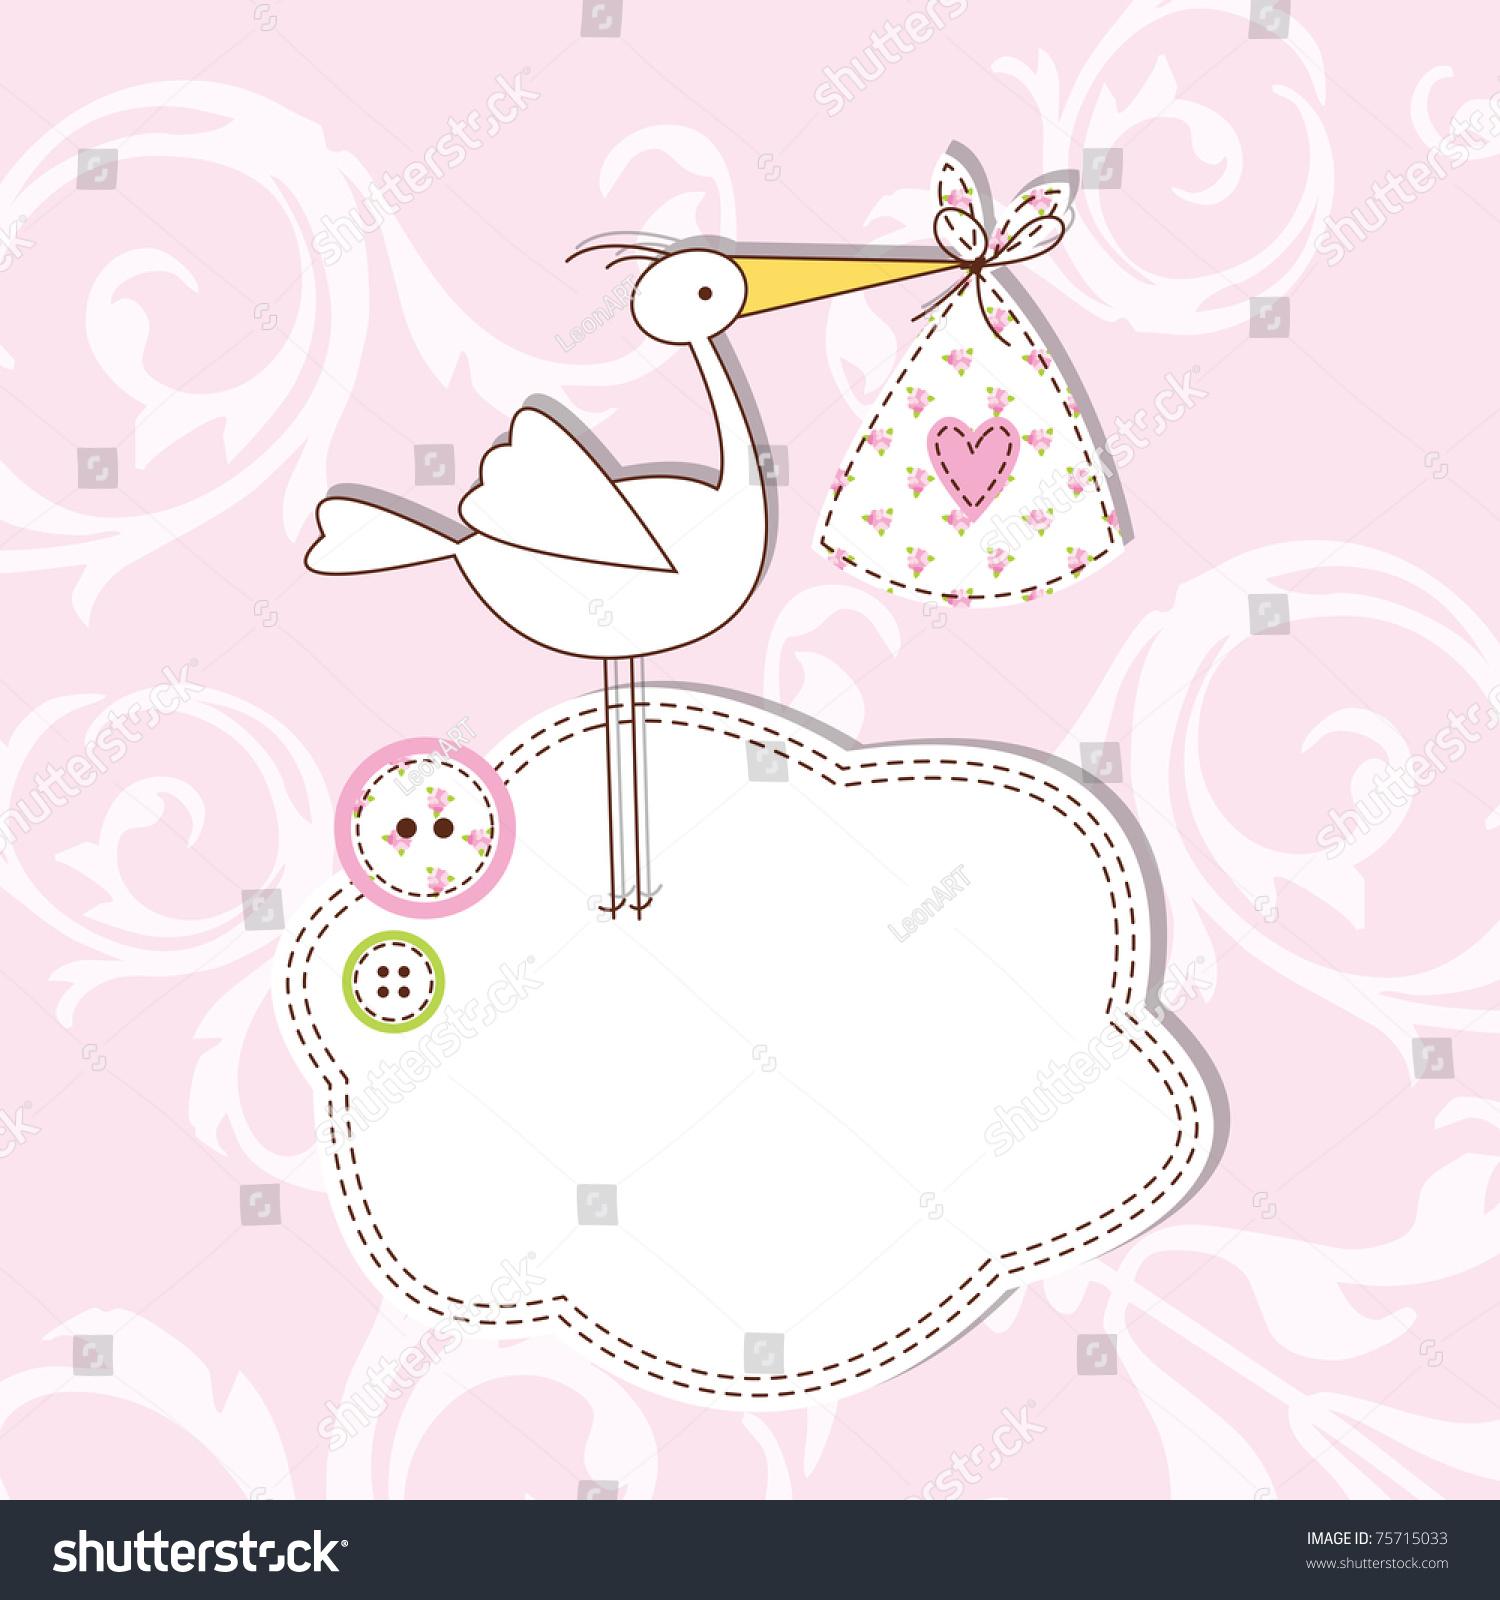 Baby Announcement Card birthday Card Cute Design – Baby Announcement Card Templates